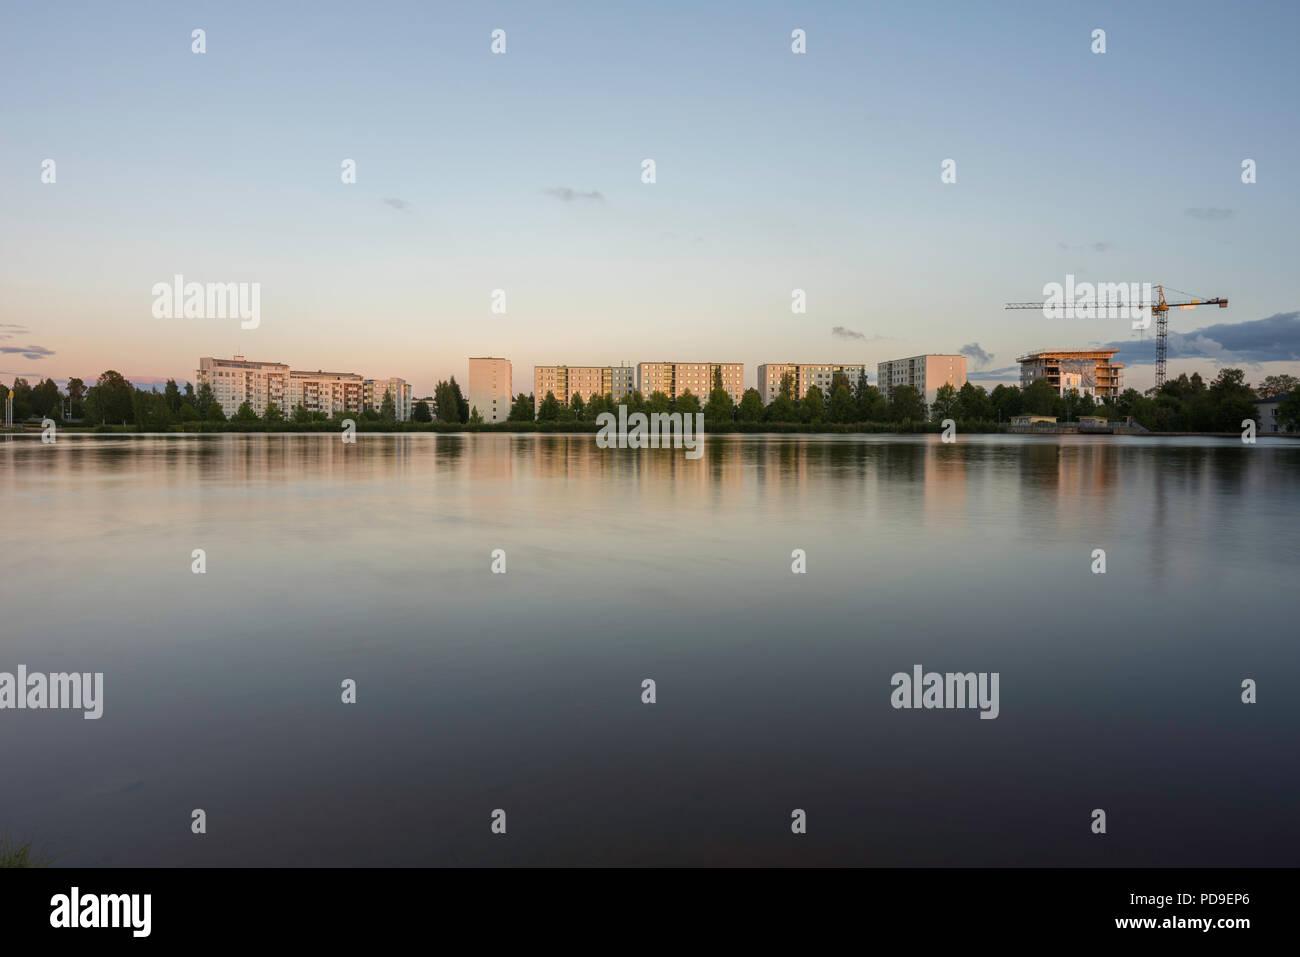 Residential buildings seen from across river Oulujoki in Oulu, Finland - Stock Image